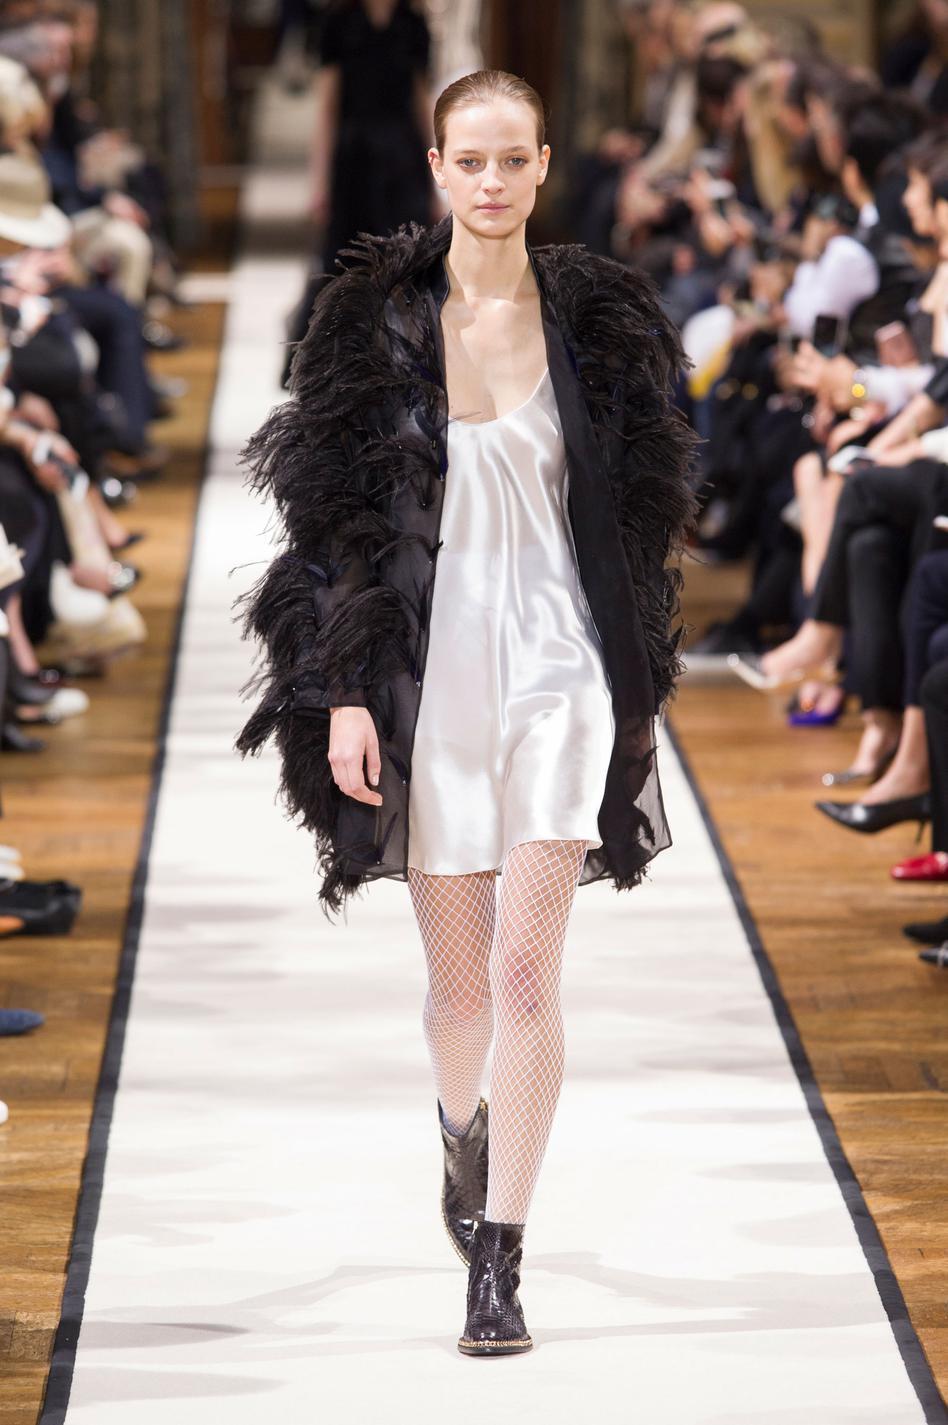 fashion week de paris les 40 images retenir madame figaro. Black Bedroom Furniture Sets. Home Design Ideas